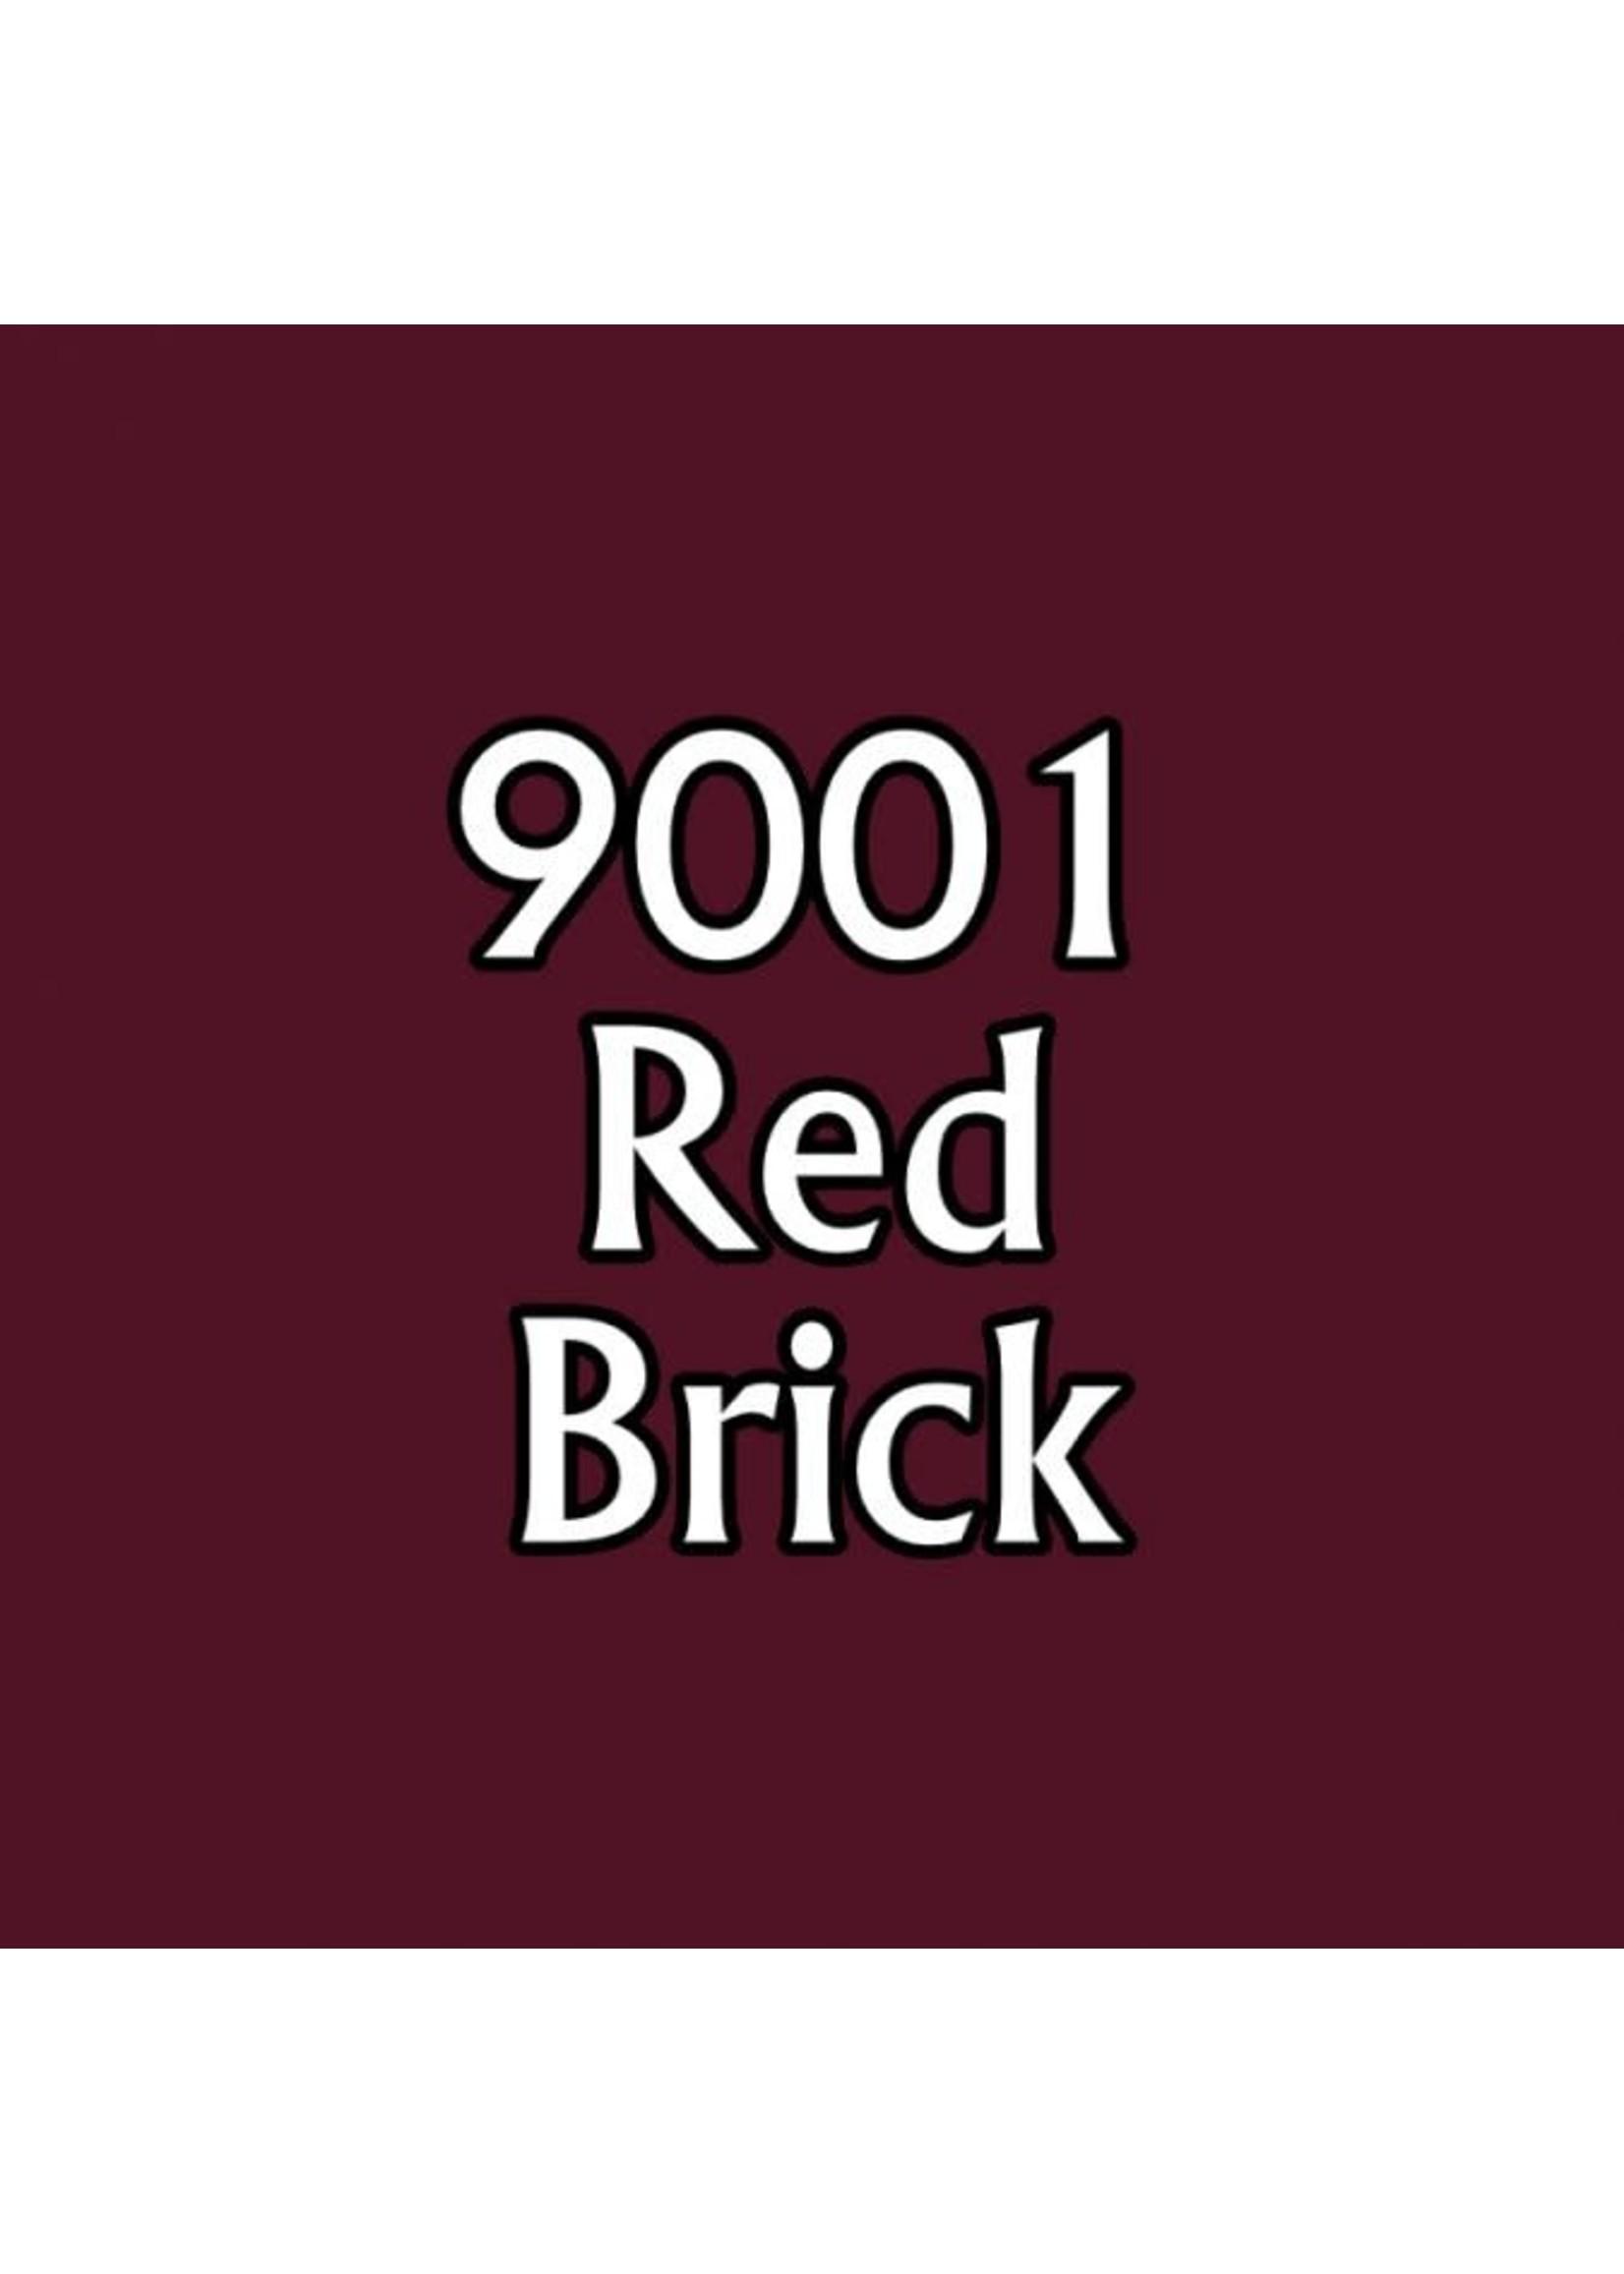 Reaper Red Brick